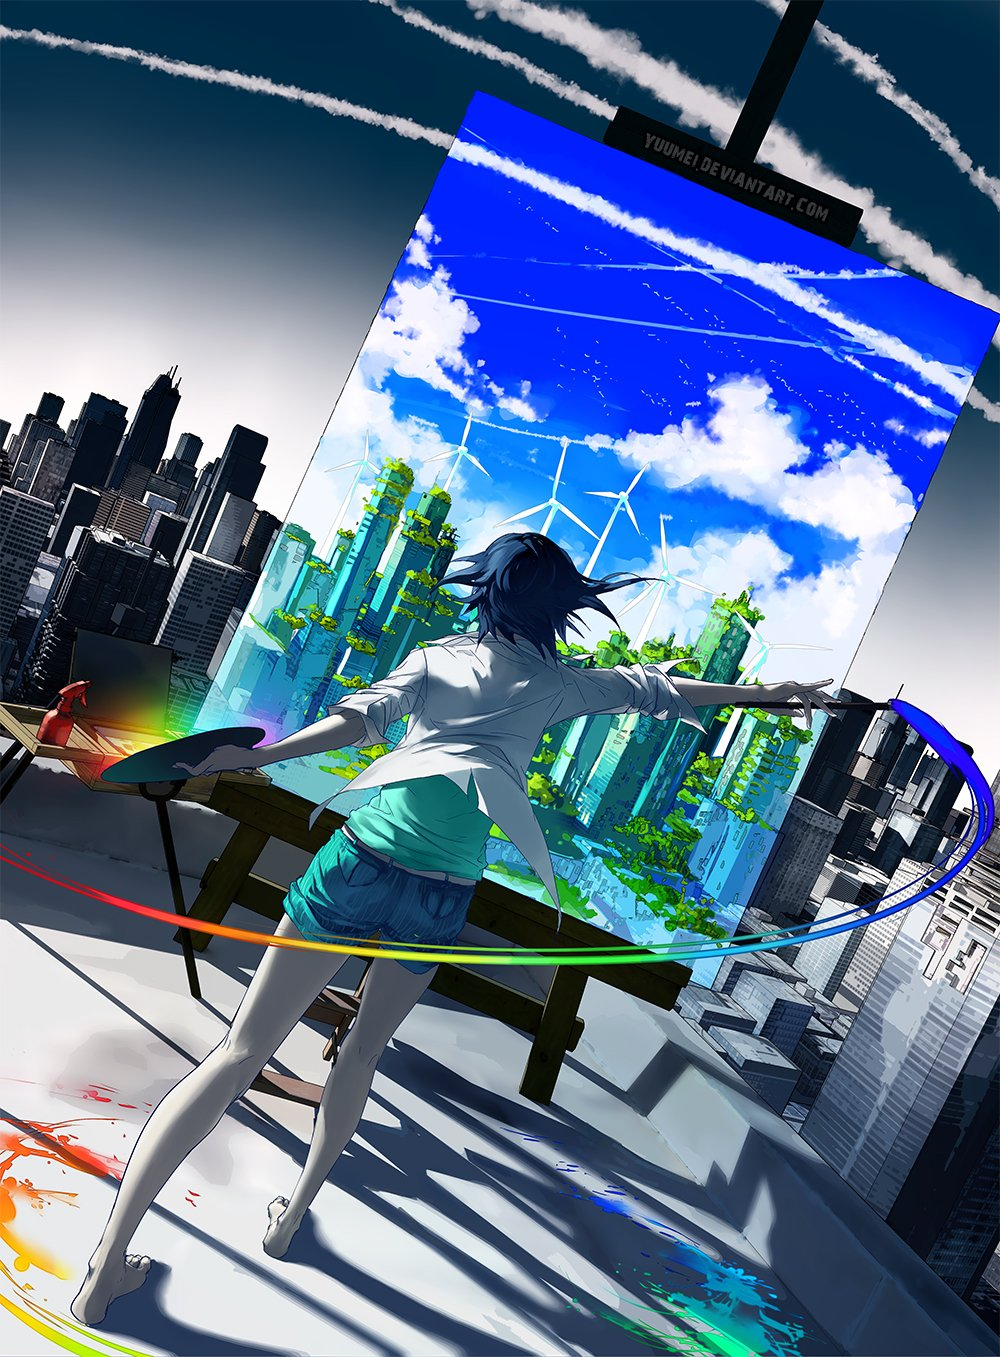 Art Yuumei и ее легкий сюрреализм. - Изображение 14